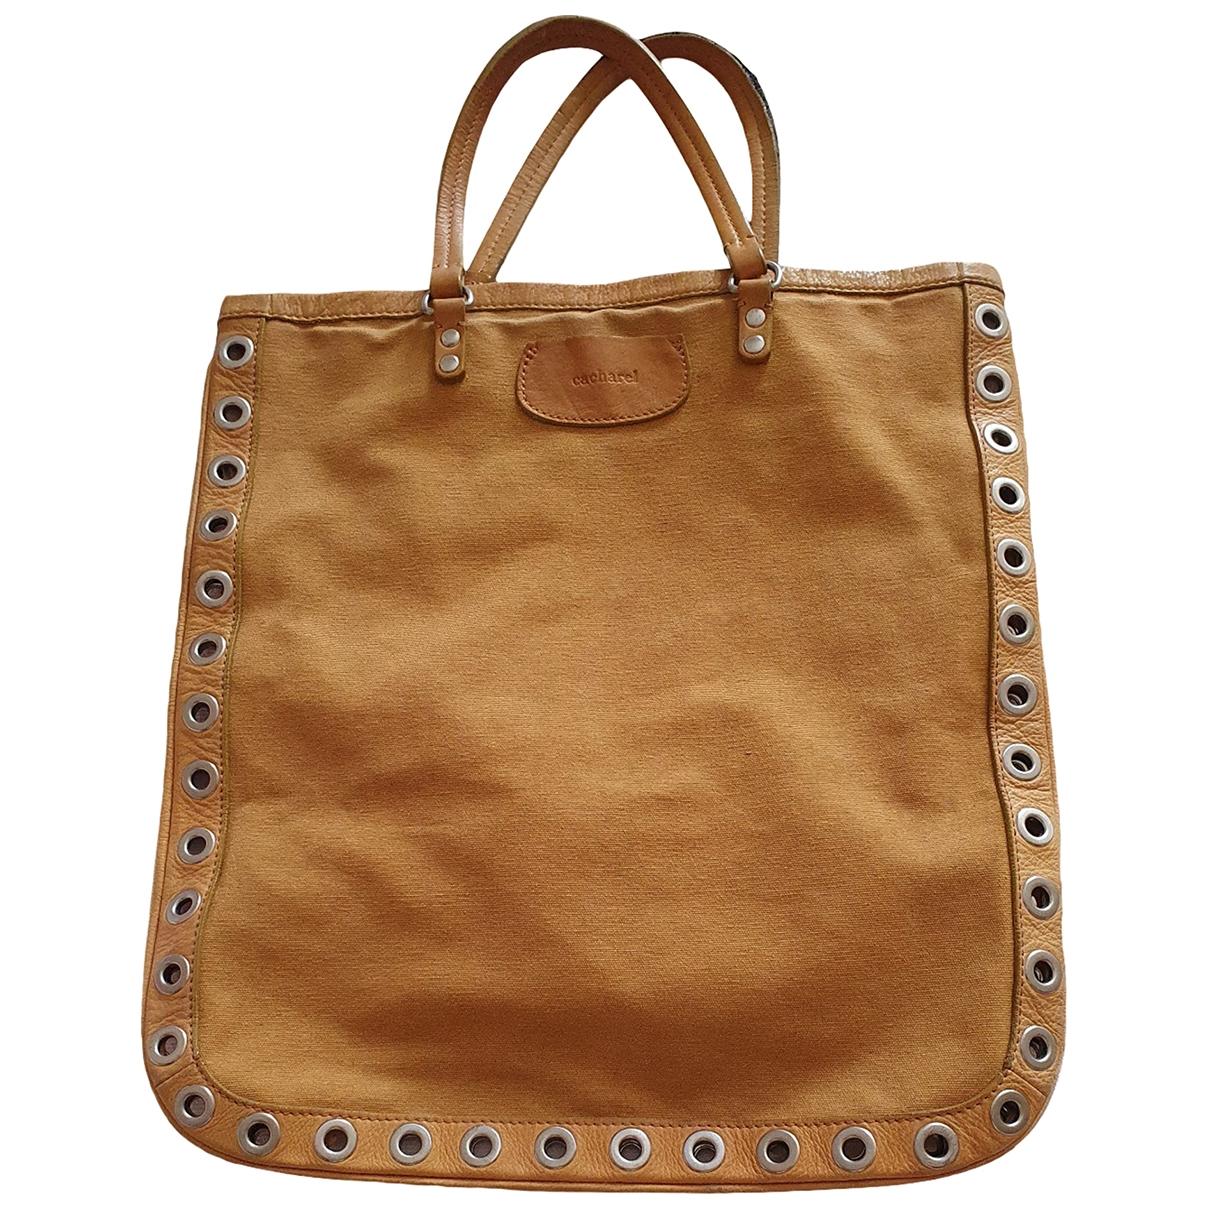 Cacharel \N Cloth handbag for Women \N